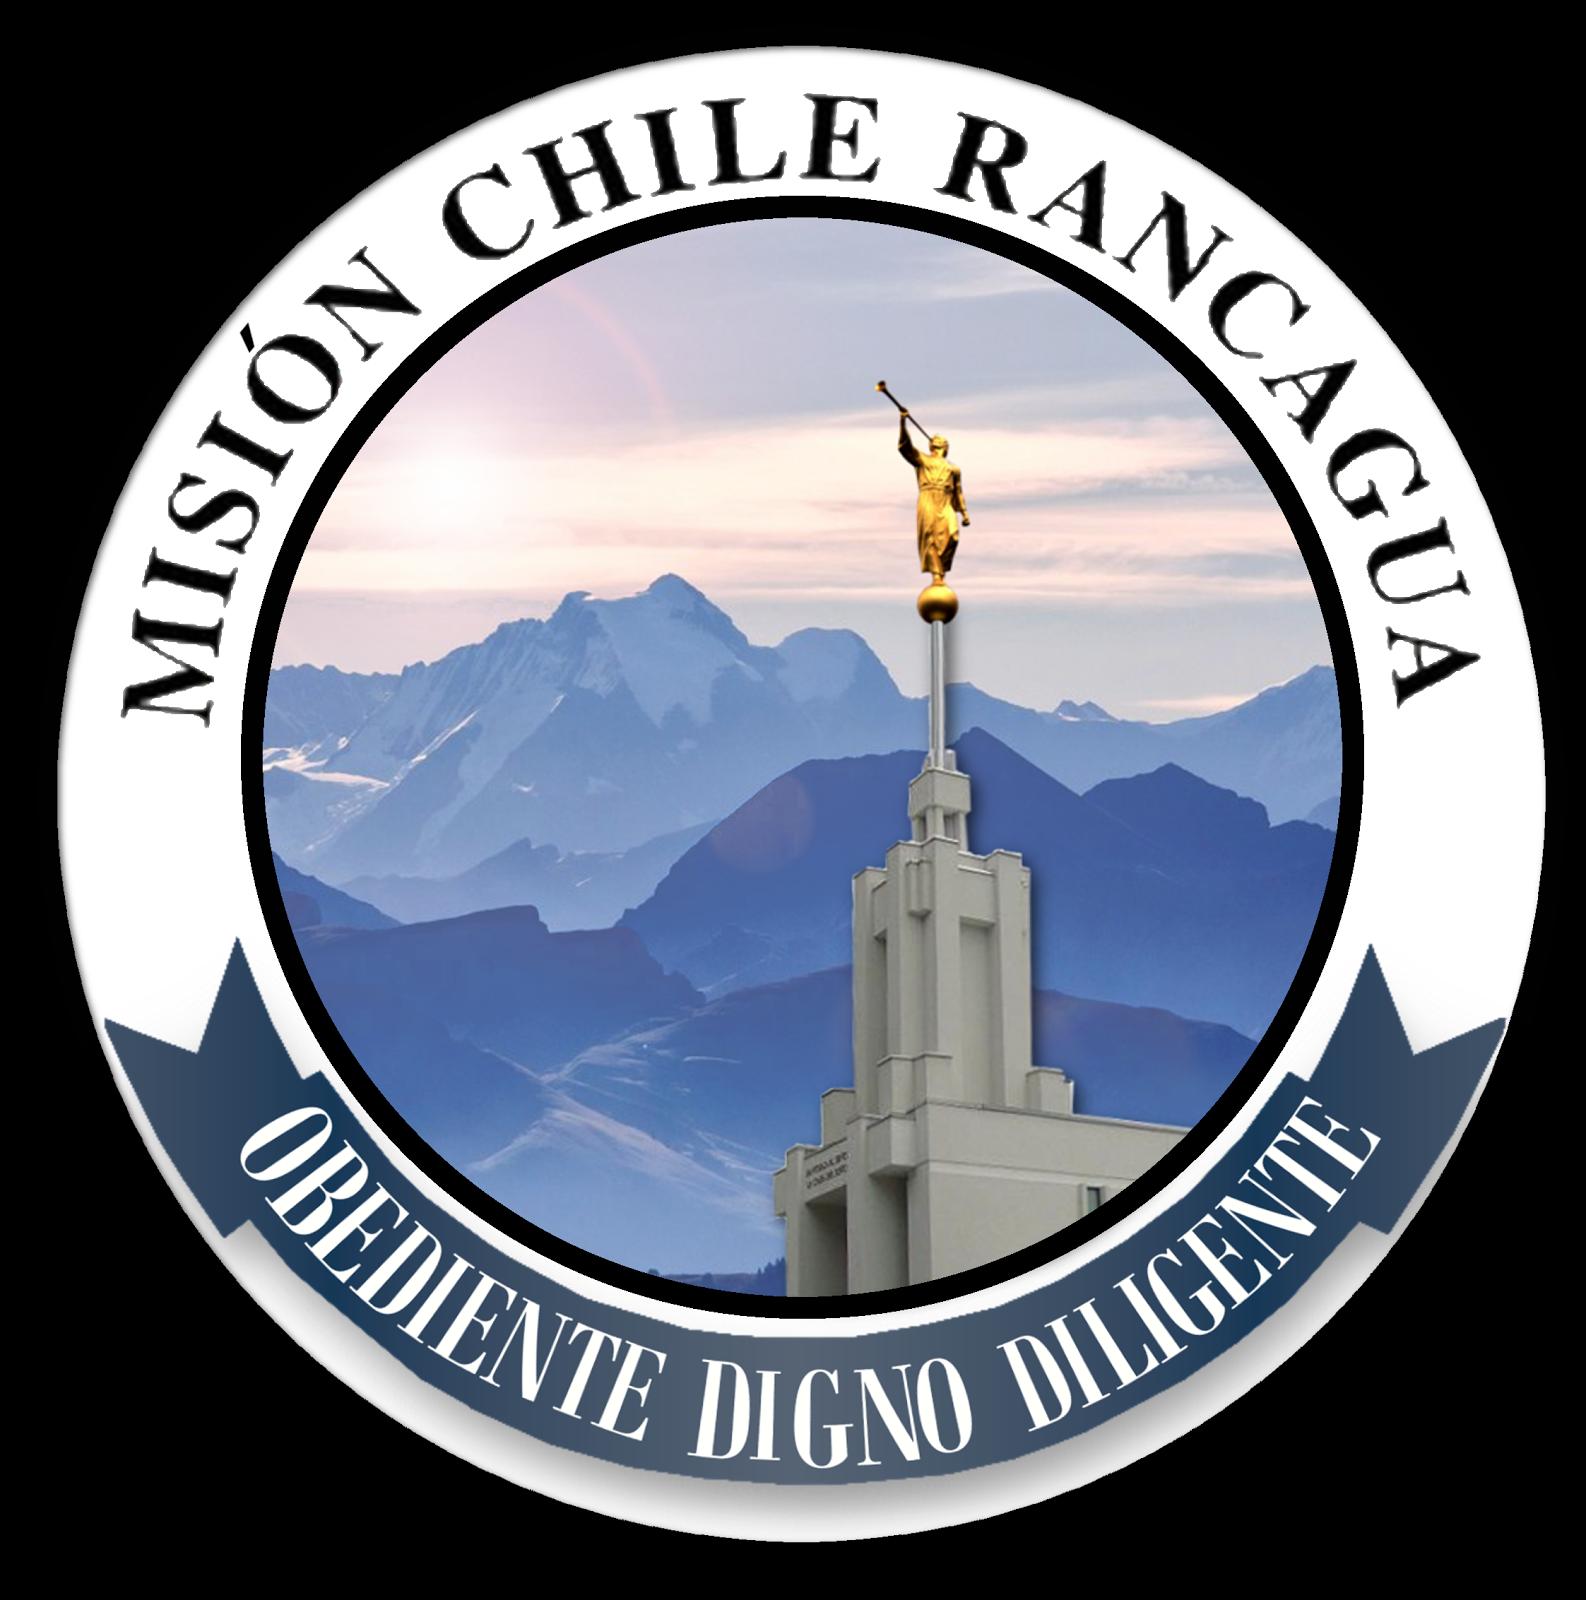 Misión Chile Rancagua